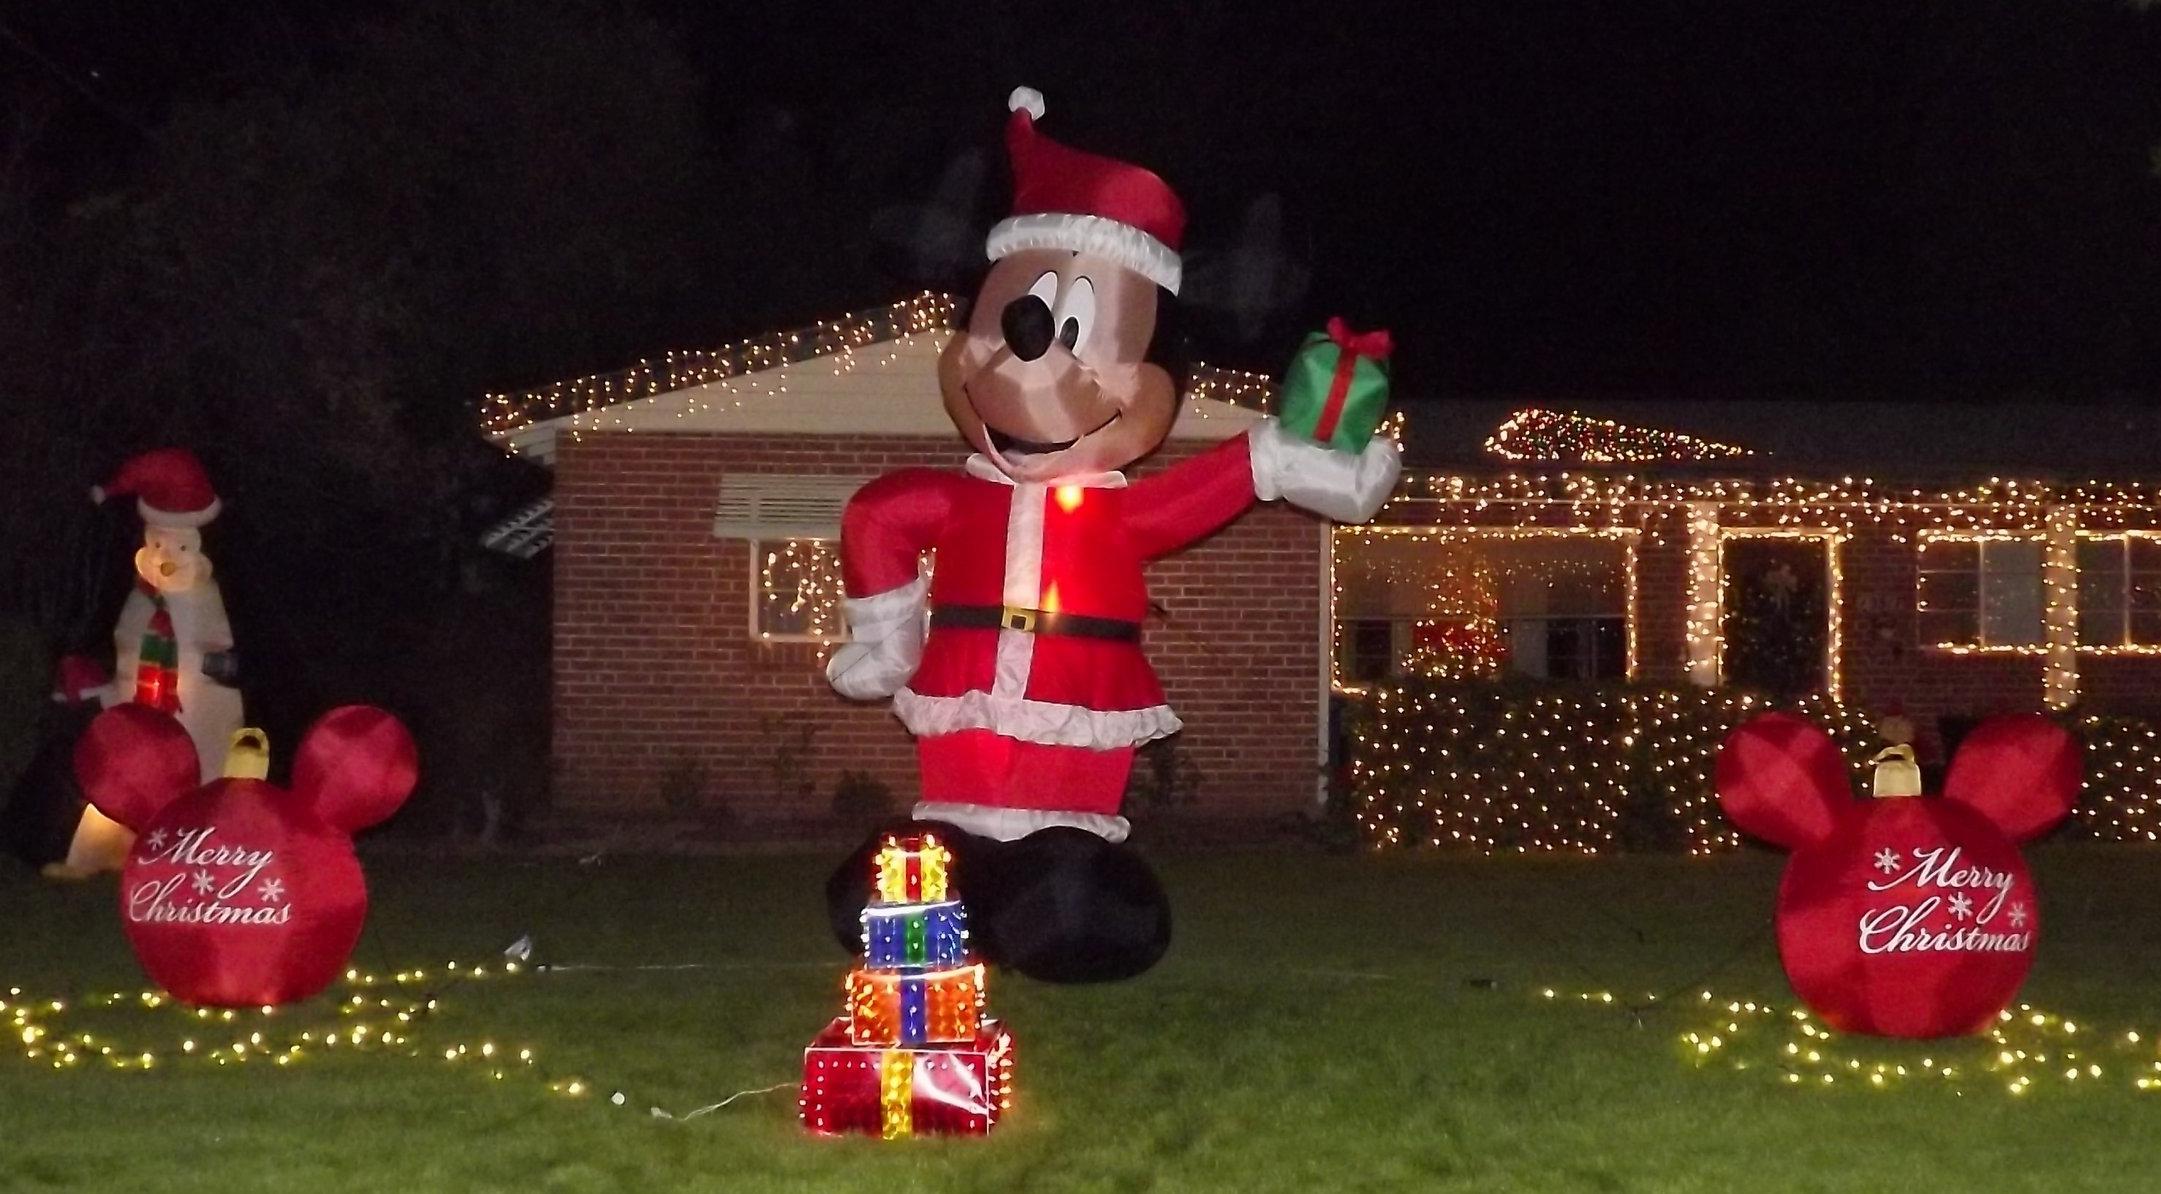 Inflatable Mickey in Santa suit, Winterhaven Lights, Tucson, Arizona